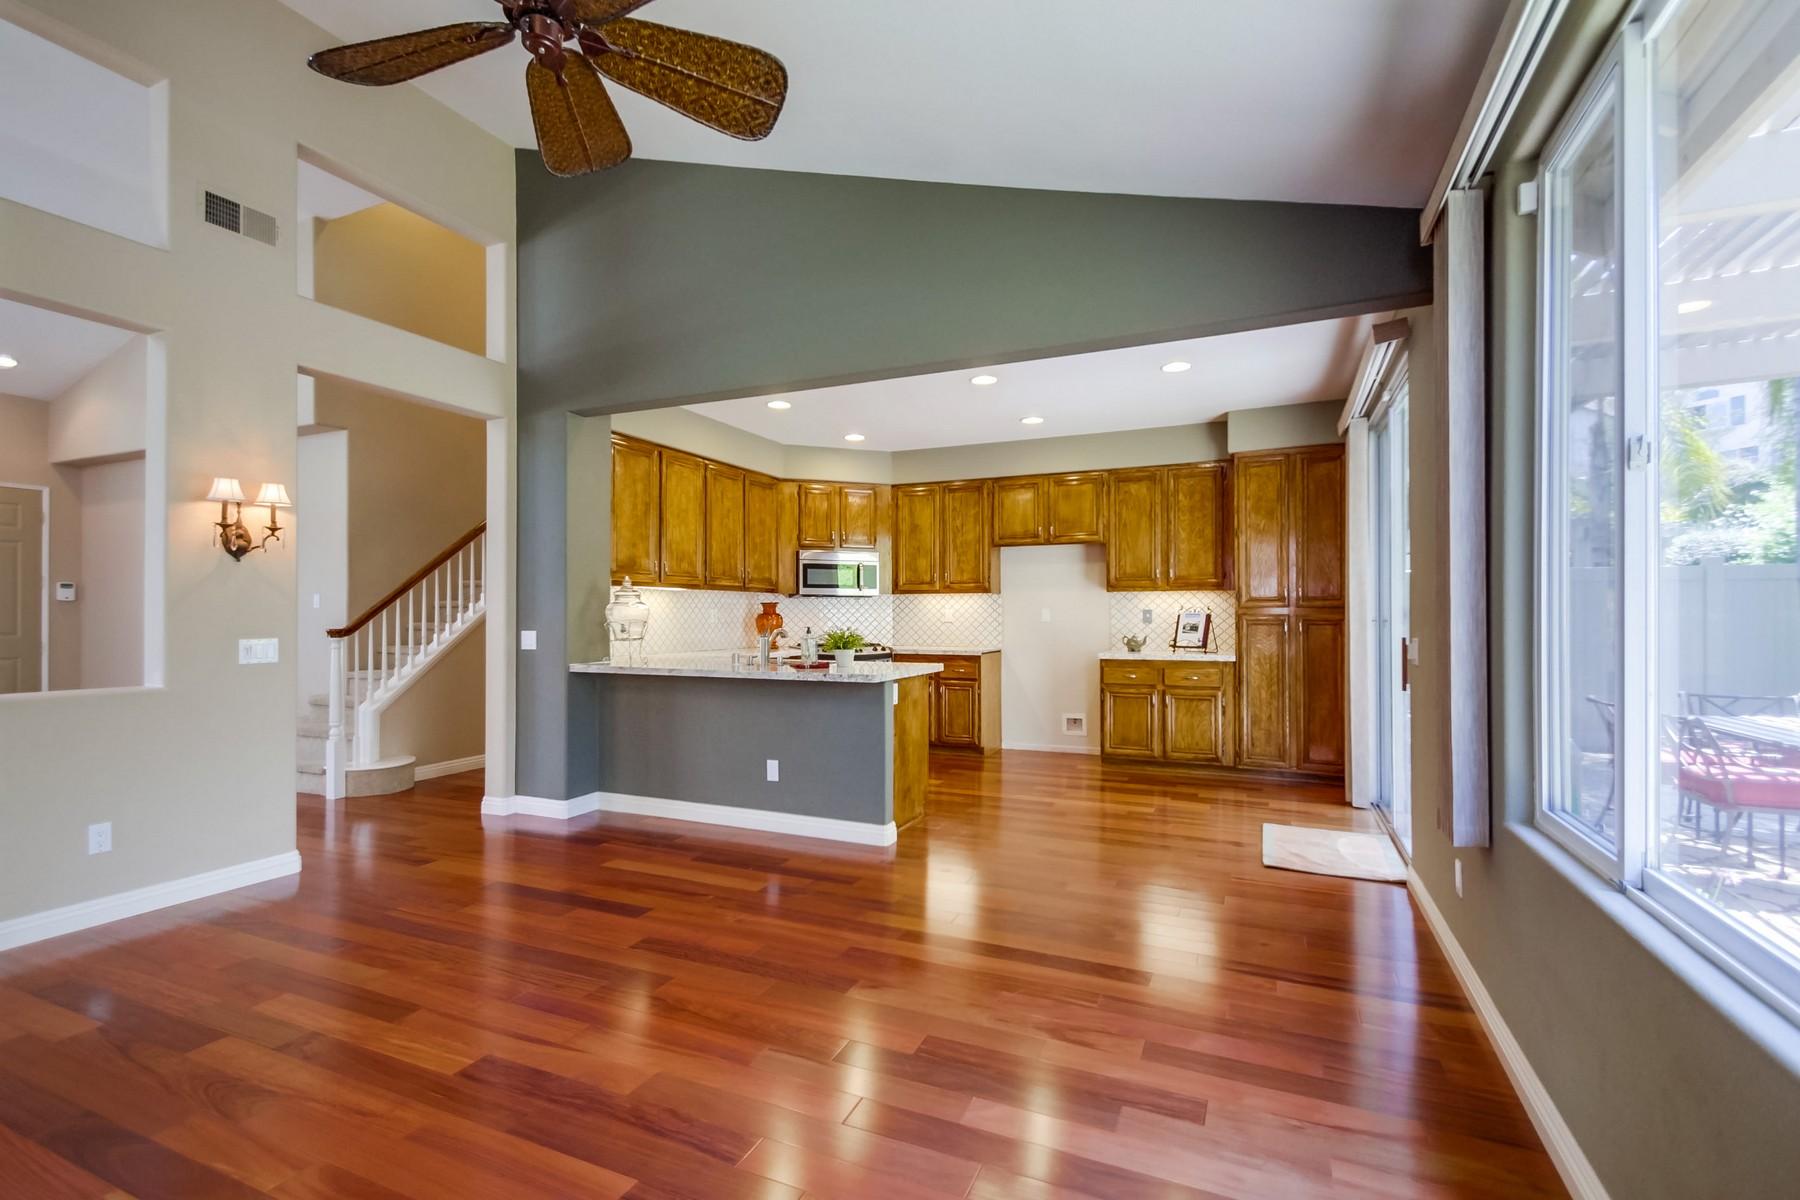 Additional photo for property listing at 18741 Caminito Pasadero 91  San Diego, Californie 92128 États-Unis